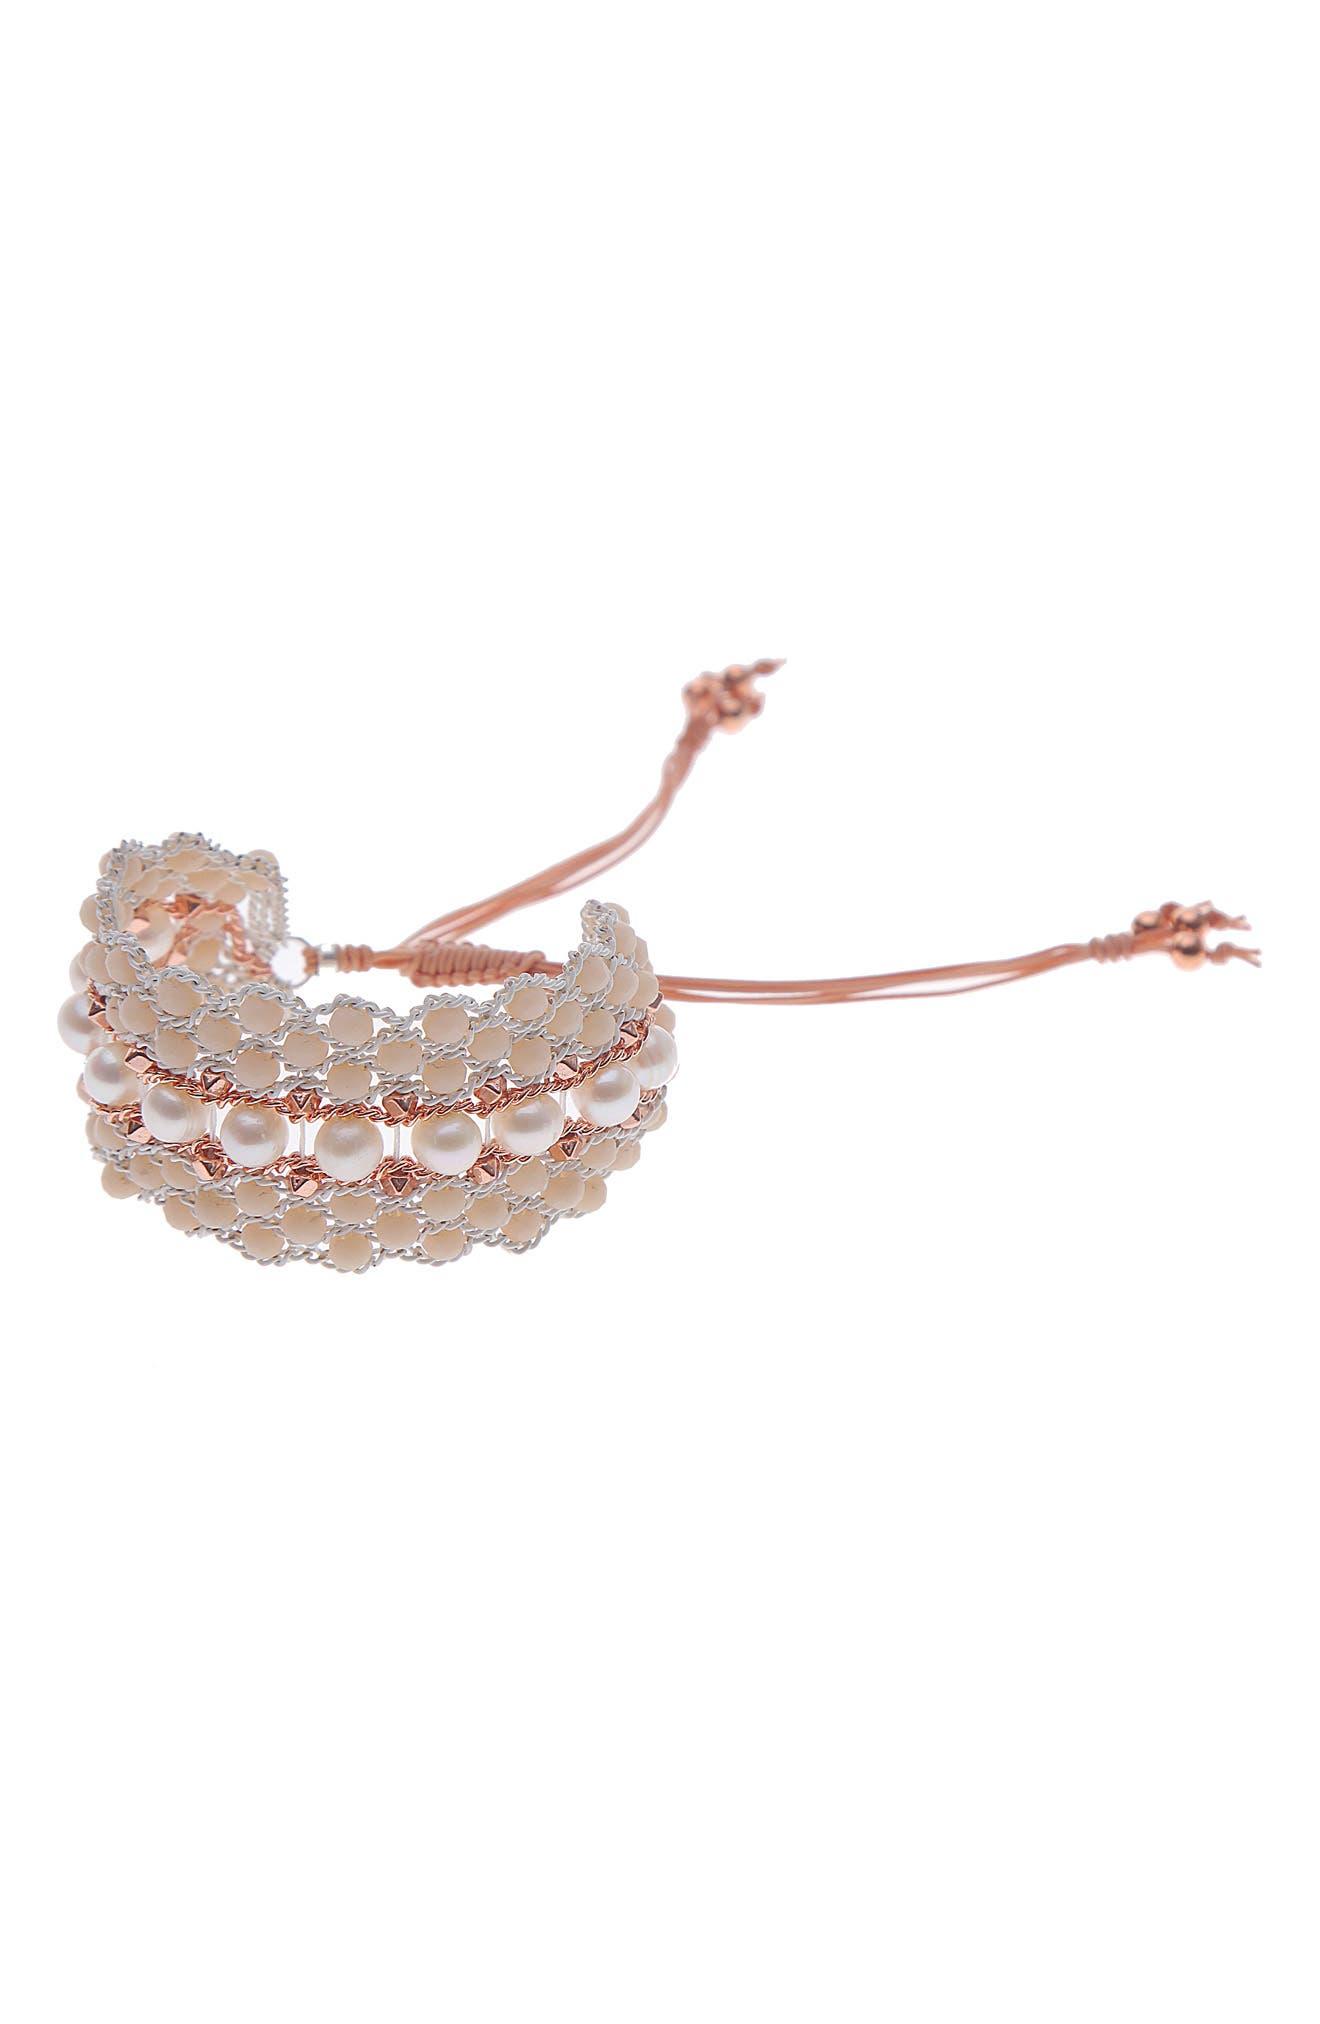 Crochet Crystal & Freshwater Pearl Bracelet,                         Main,                         color, 900